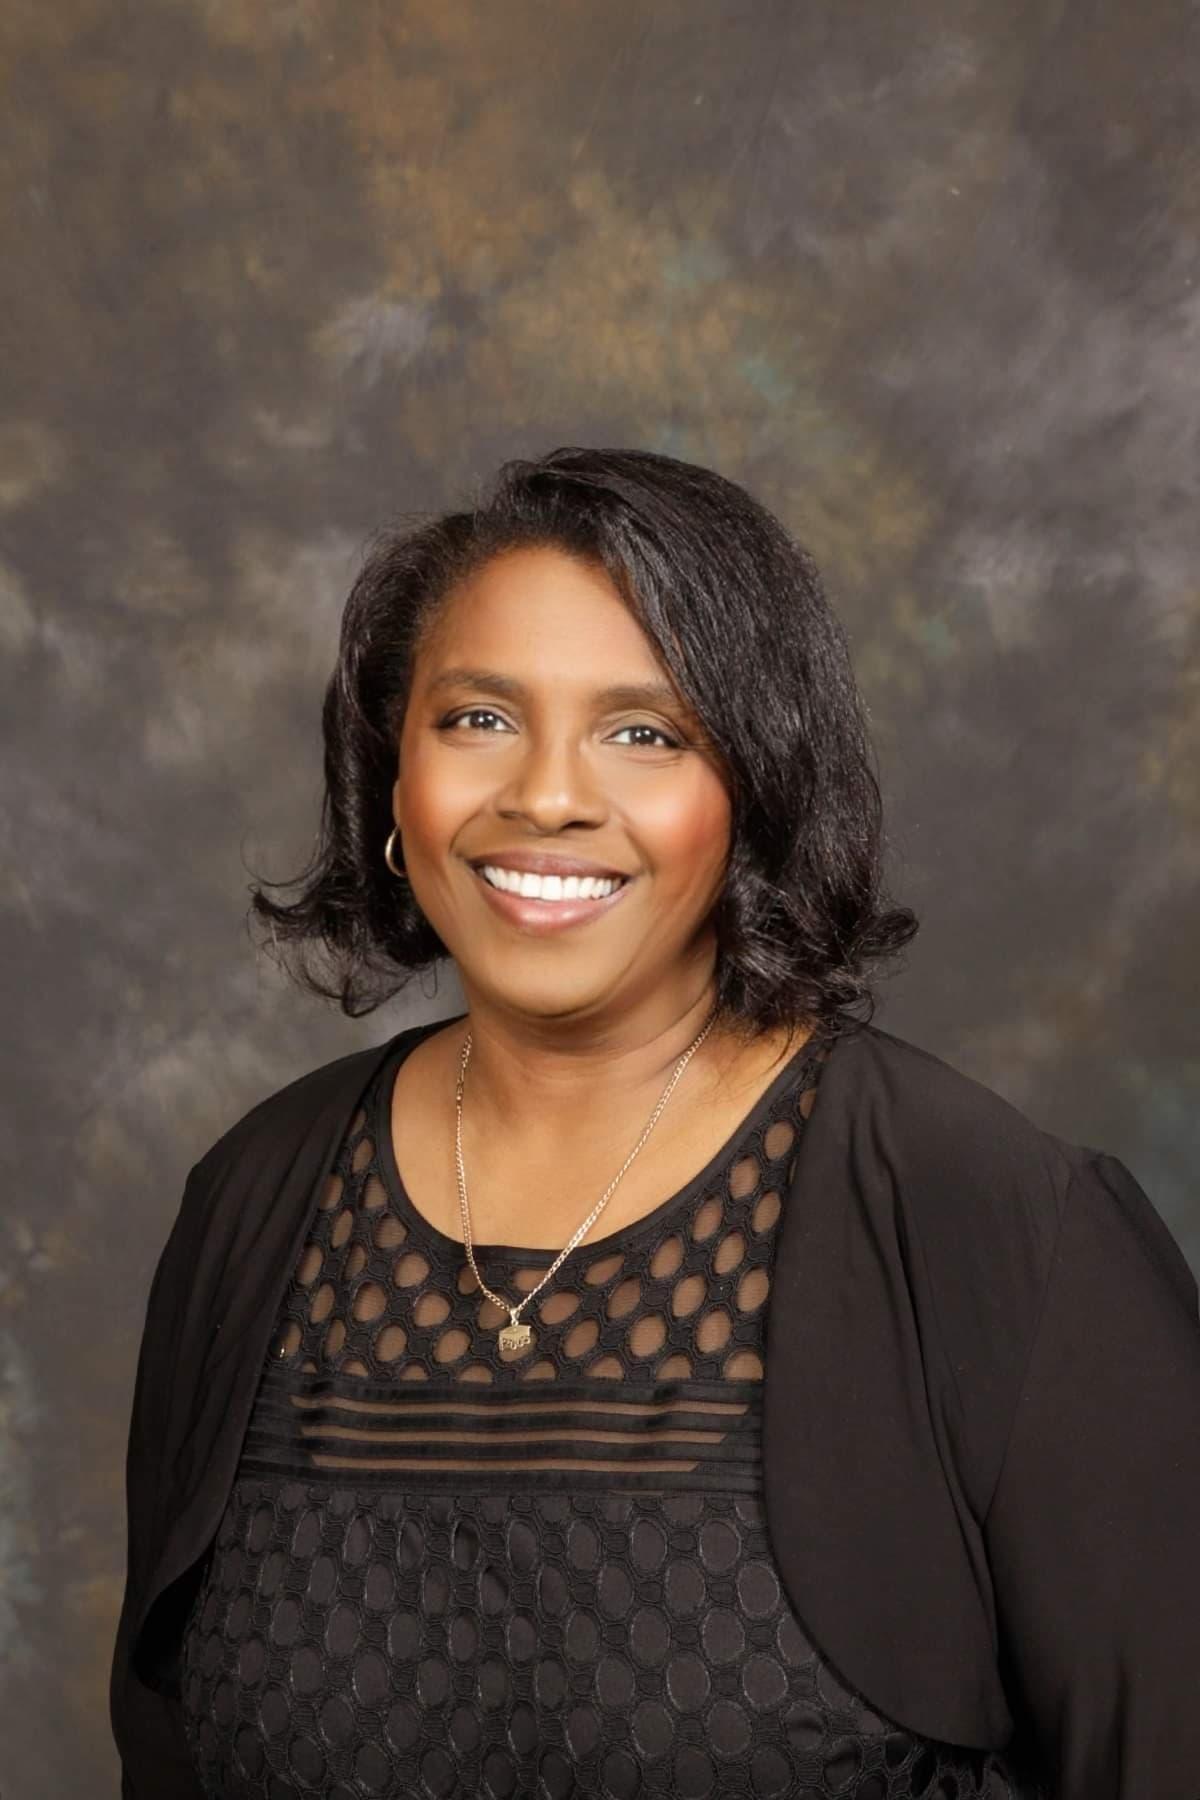 Sis. Brenda Kaye Foreman